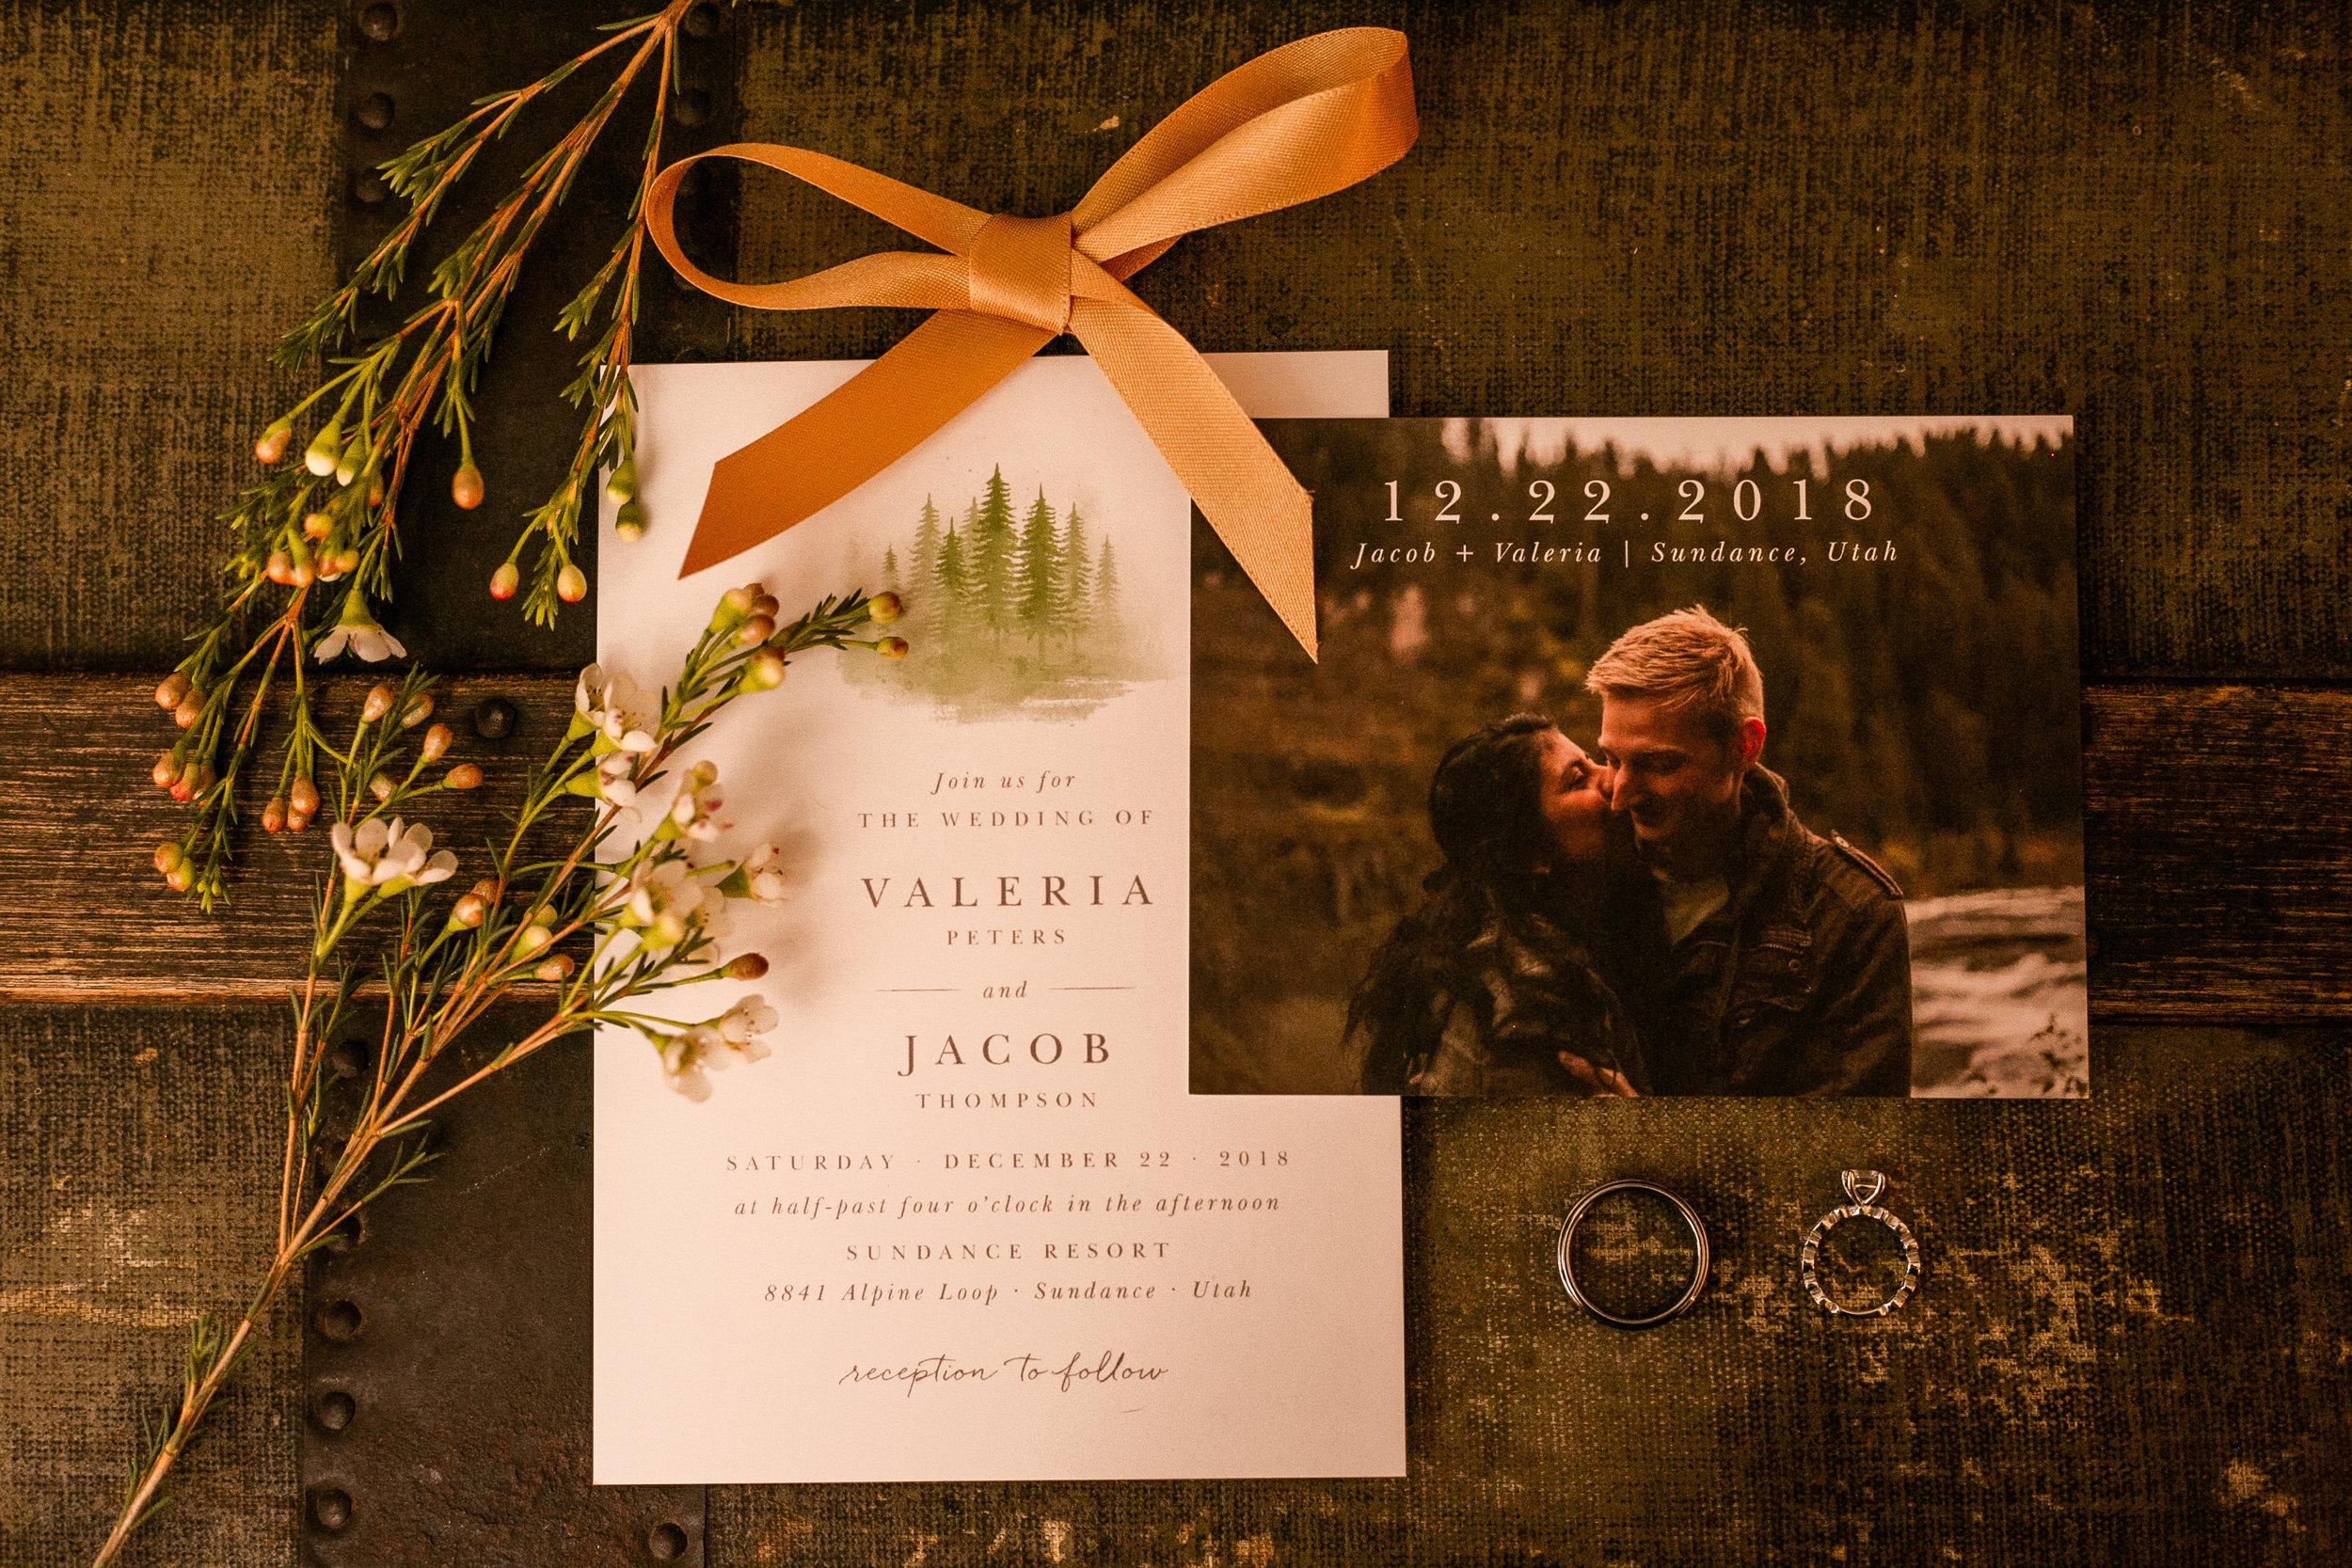 BASIC-INVITE-CUSTOM-WEDDING-INVITATIONS7.jpg